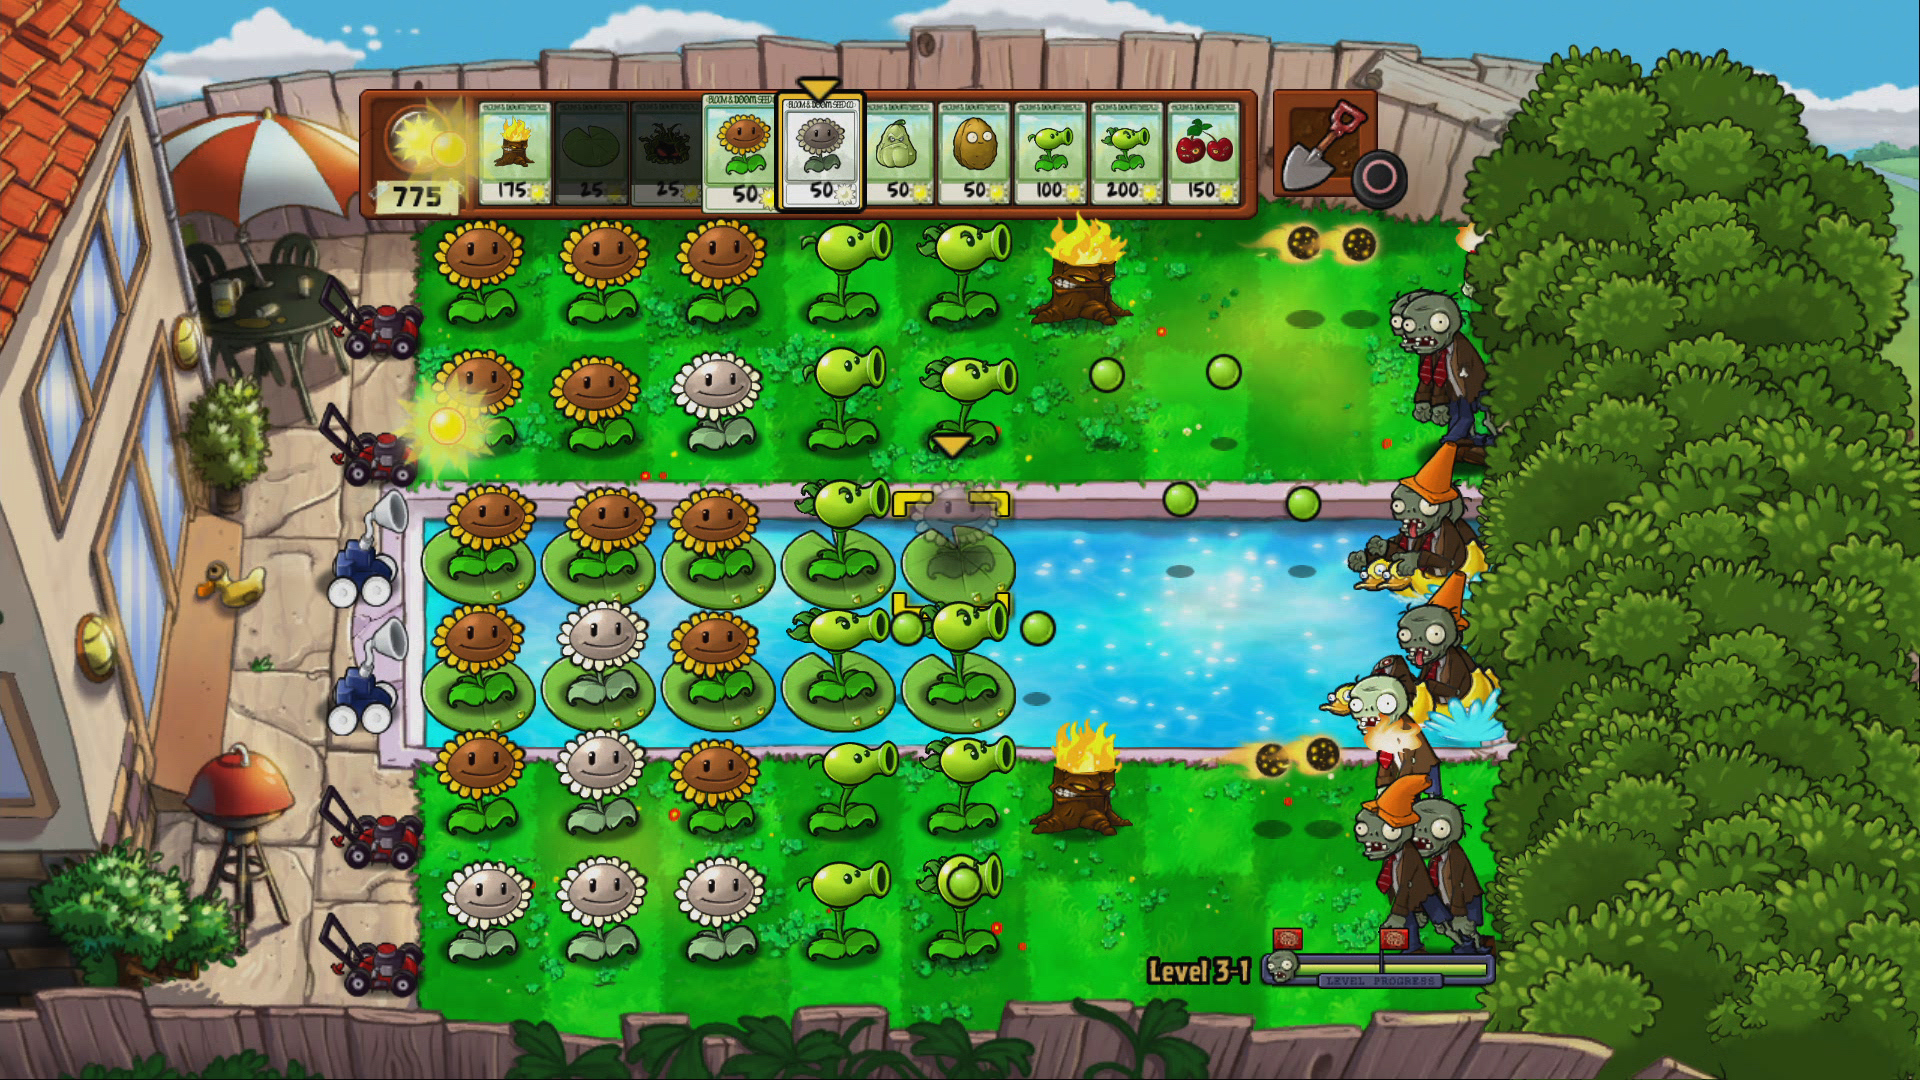 Para esta review vamos a pretender que nunca jugamos Plants Vs Zombies